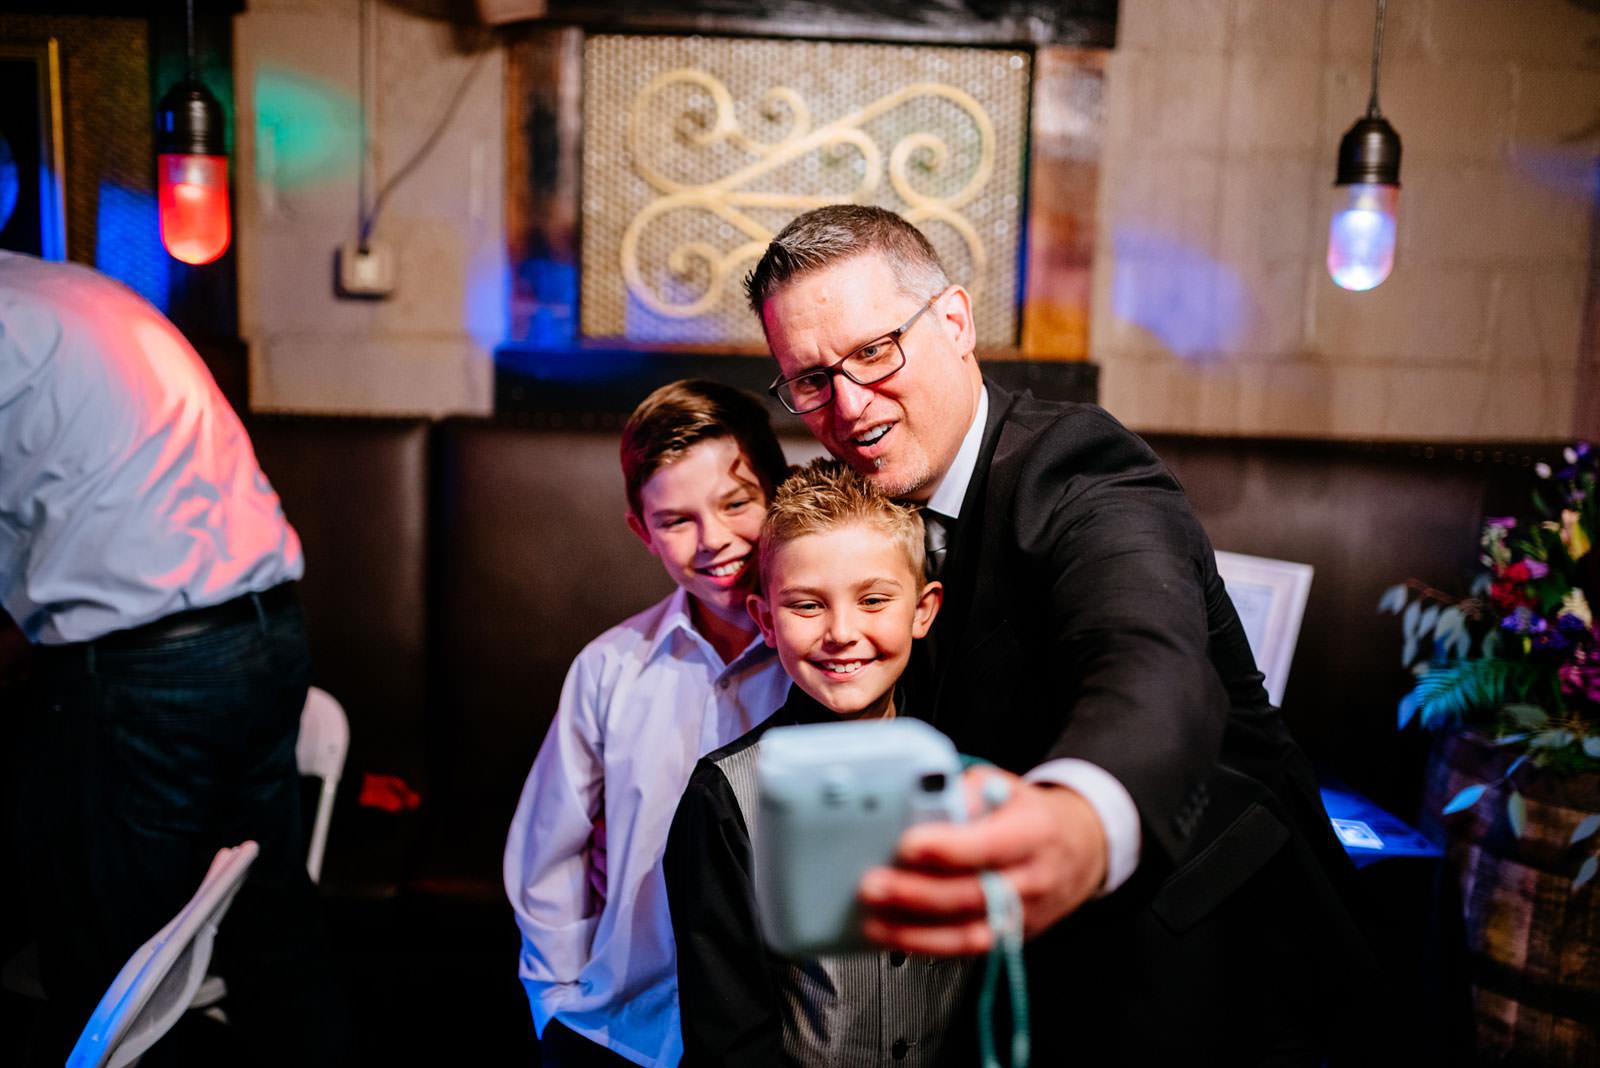 wedding guests using instax camera selfie